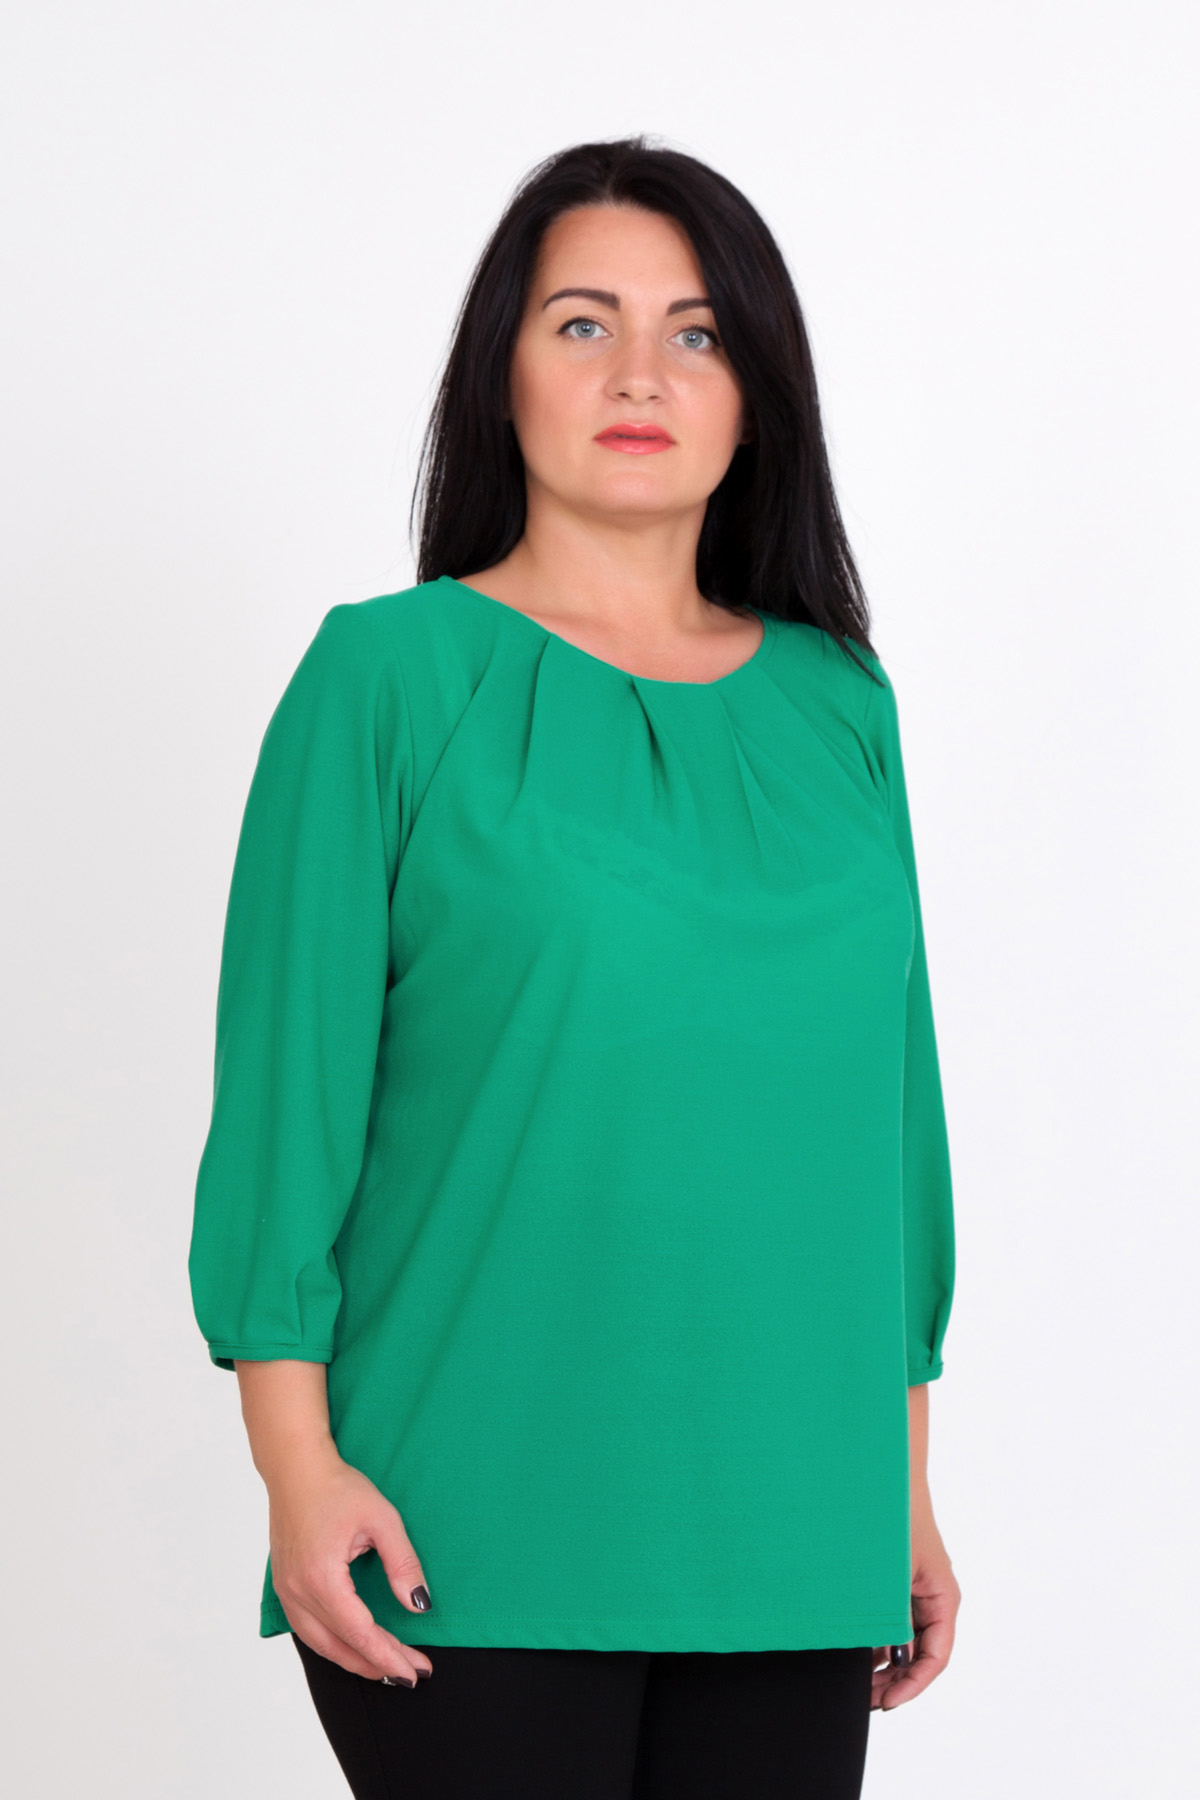 Жен. блуза Лайма р. 58Блузы<br>Обхват груди:116 см<br>Обхват талии:97 см<br>Обхват бедер:124 см<br>Длина по спинке:66 см<br>Рост:167 см<br><br>Тип: Жен. блуза<br>Размер: 58<br>Материал: Креп